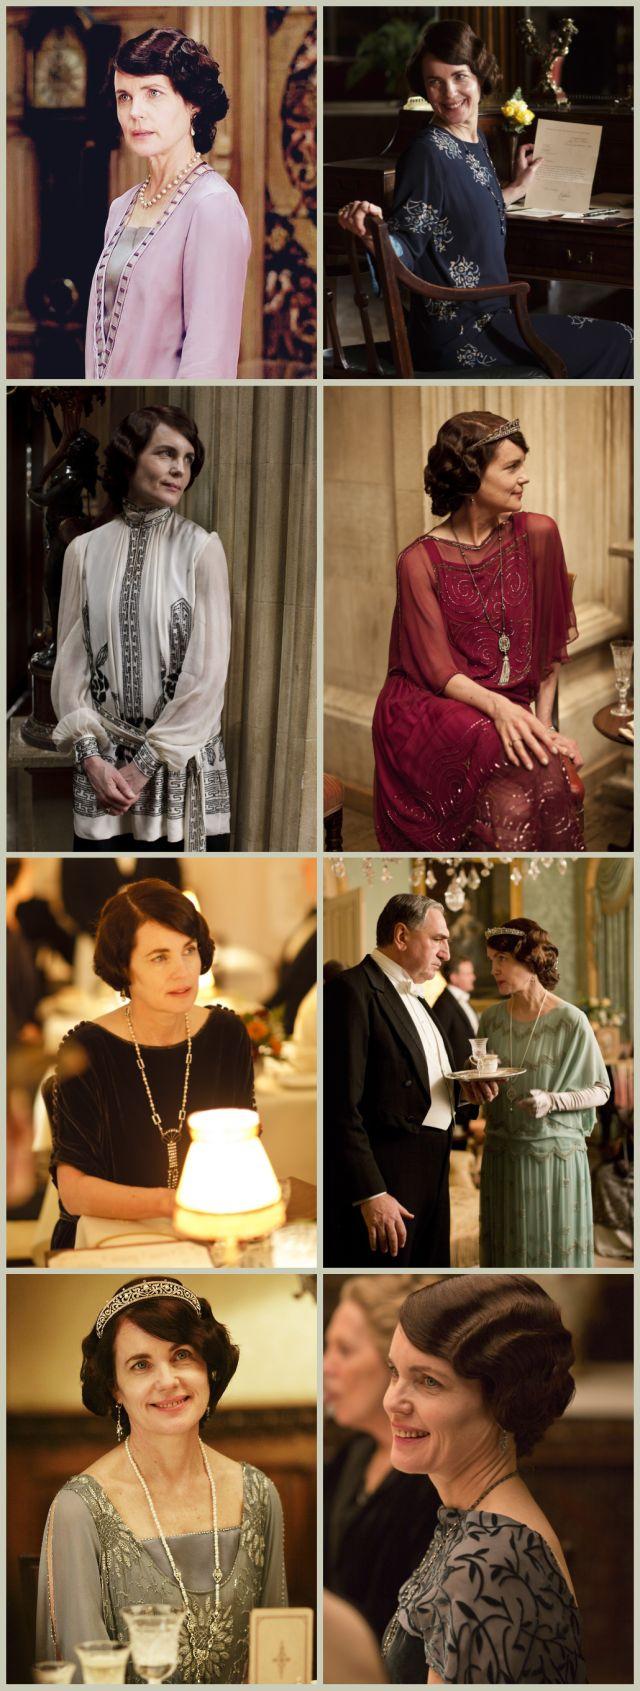 Elizabeth McGovern as Cora Crawley, Countess of Grantham, Downton Abbey season 4